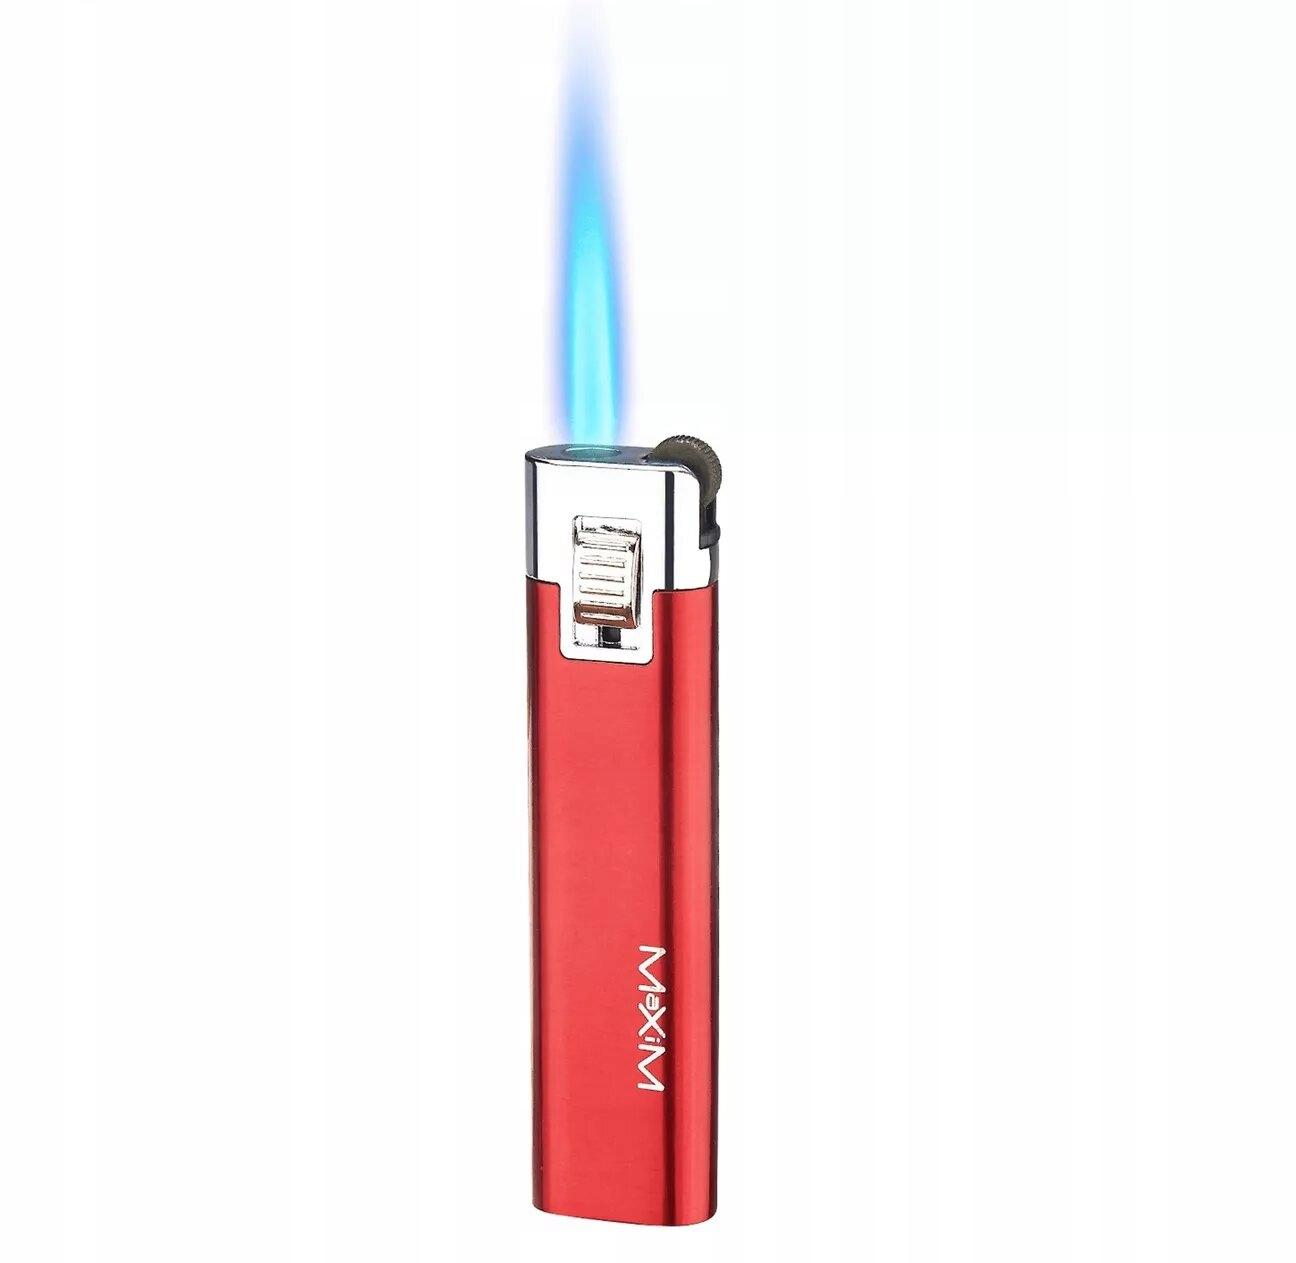 Зажигалка горелки Максим Пуссен для испарителей